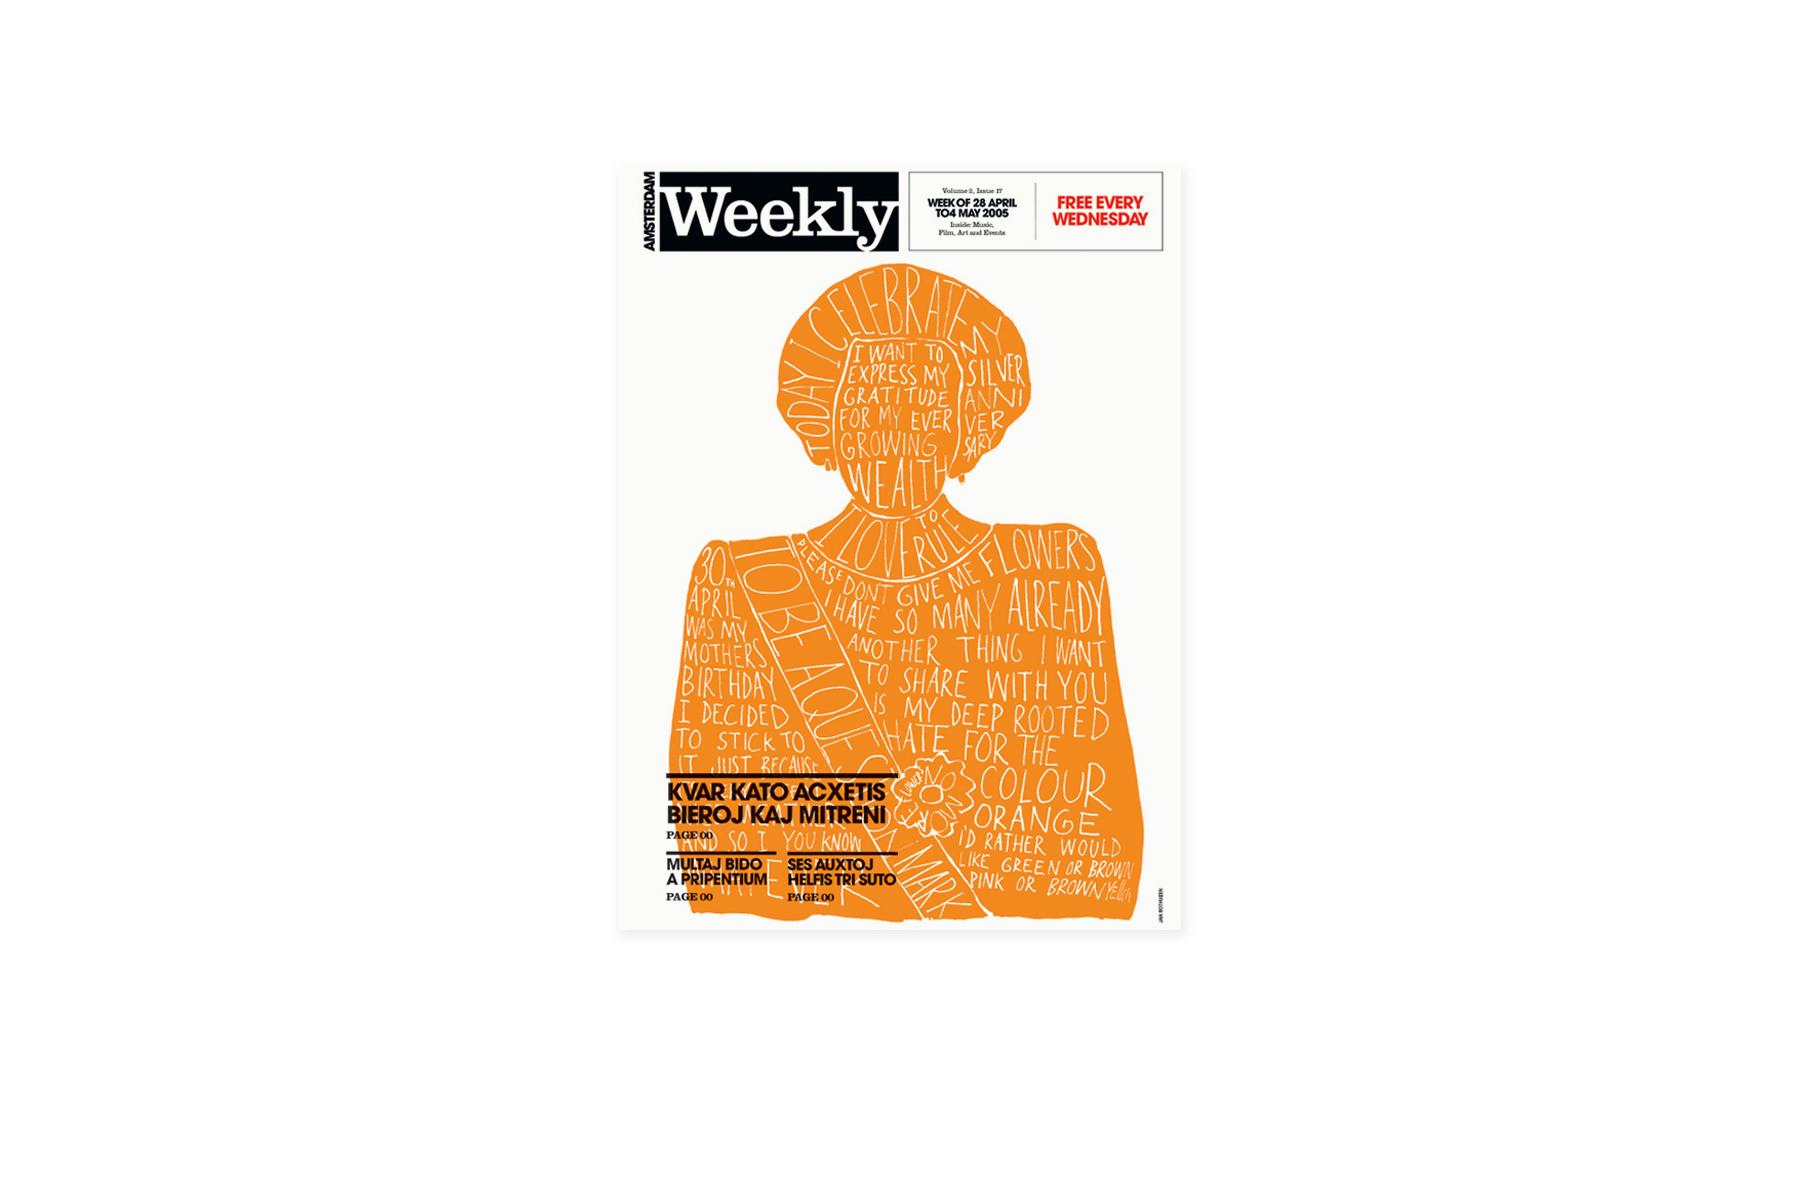 JAN ROTHUIZEN-Amsterdam Weekly